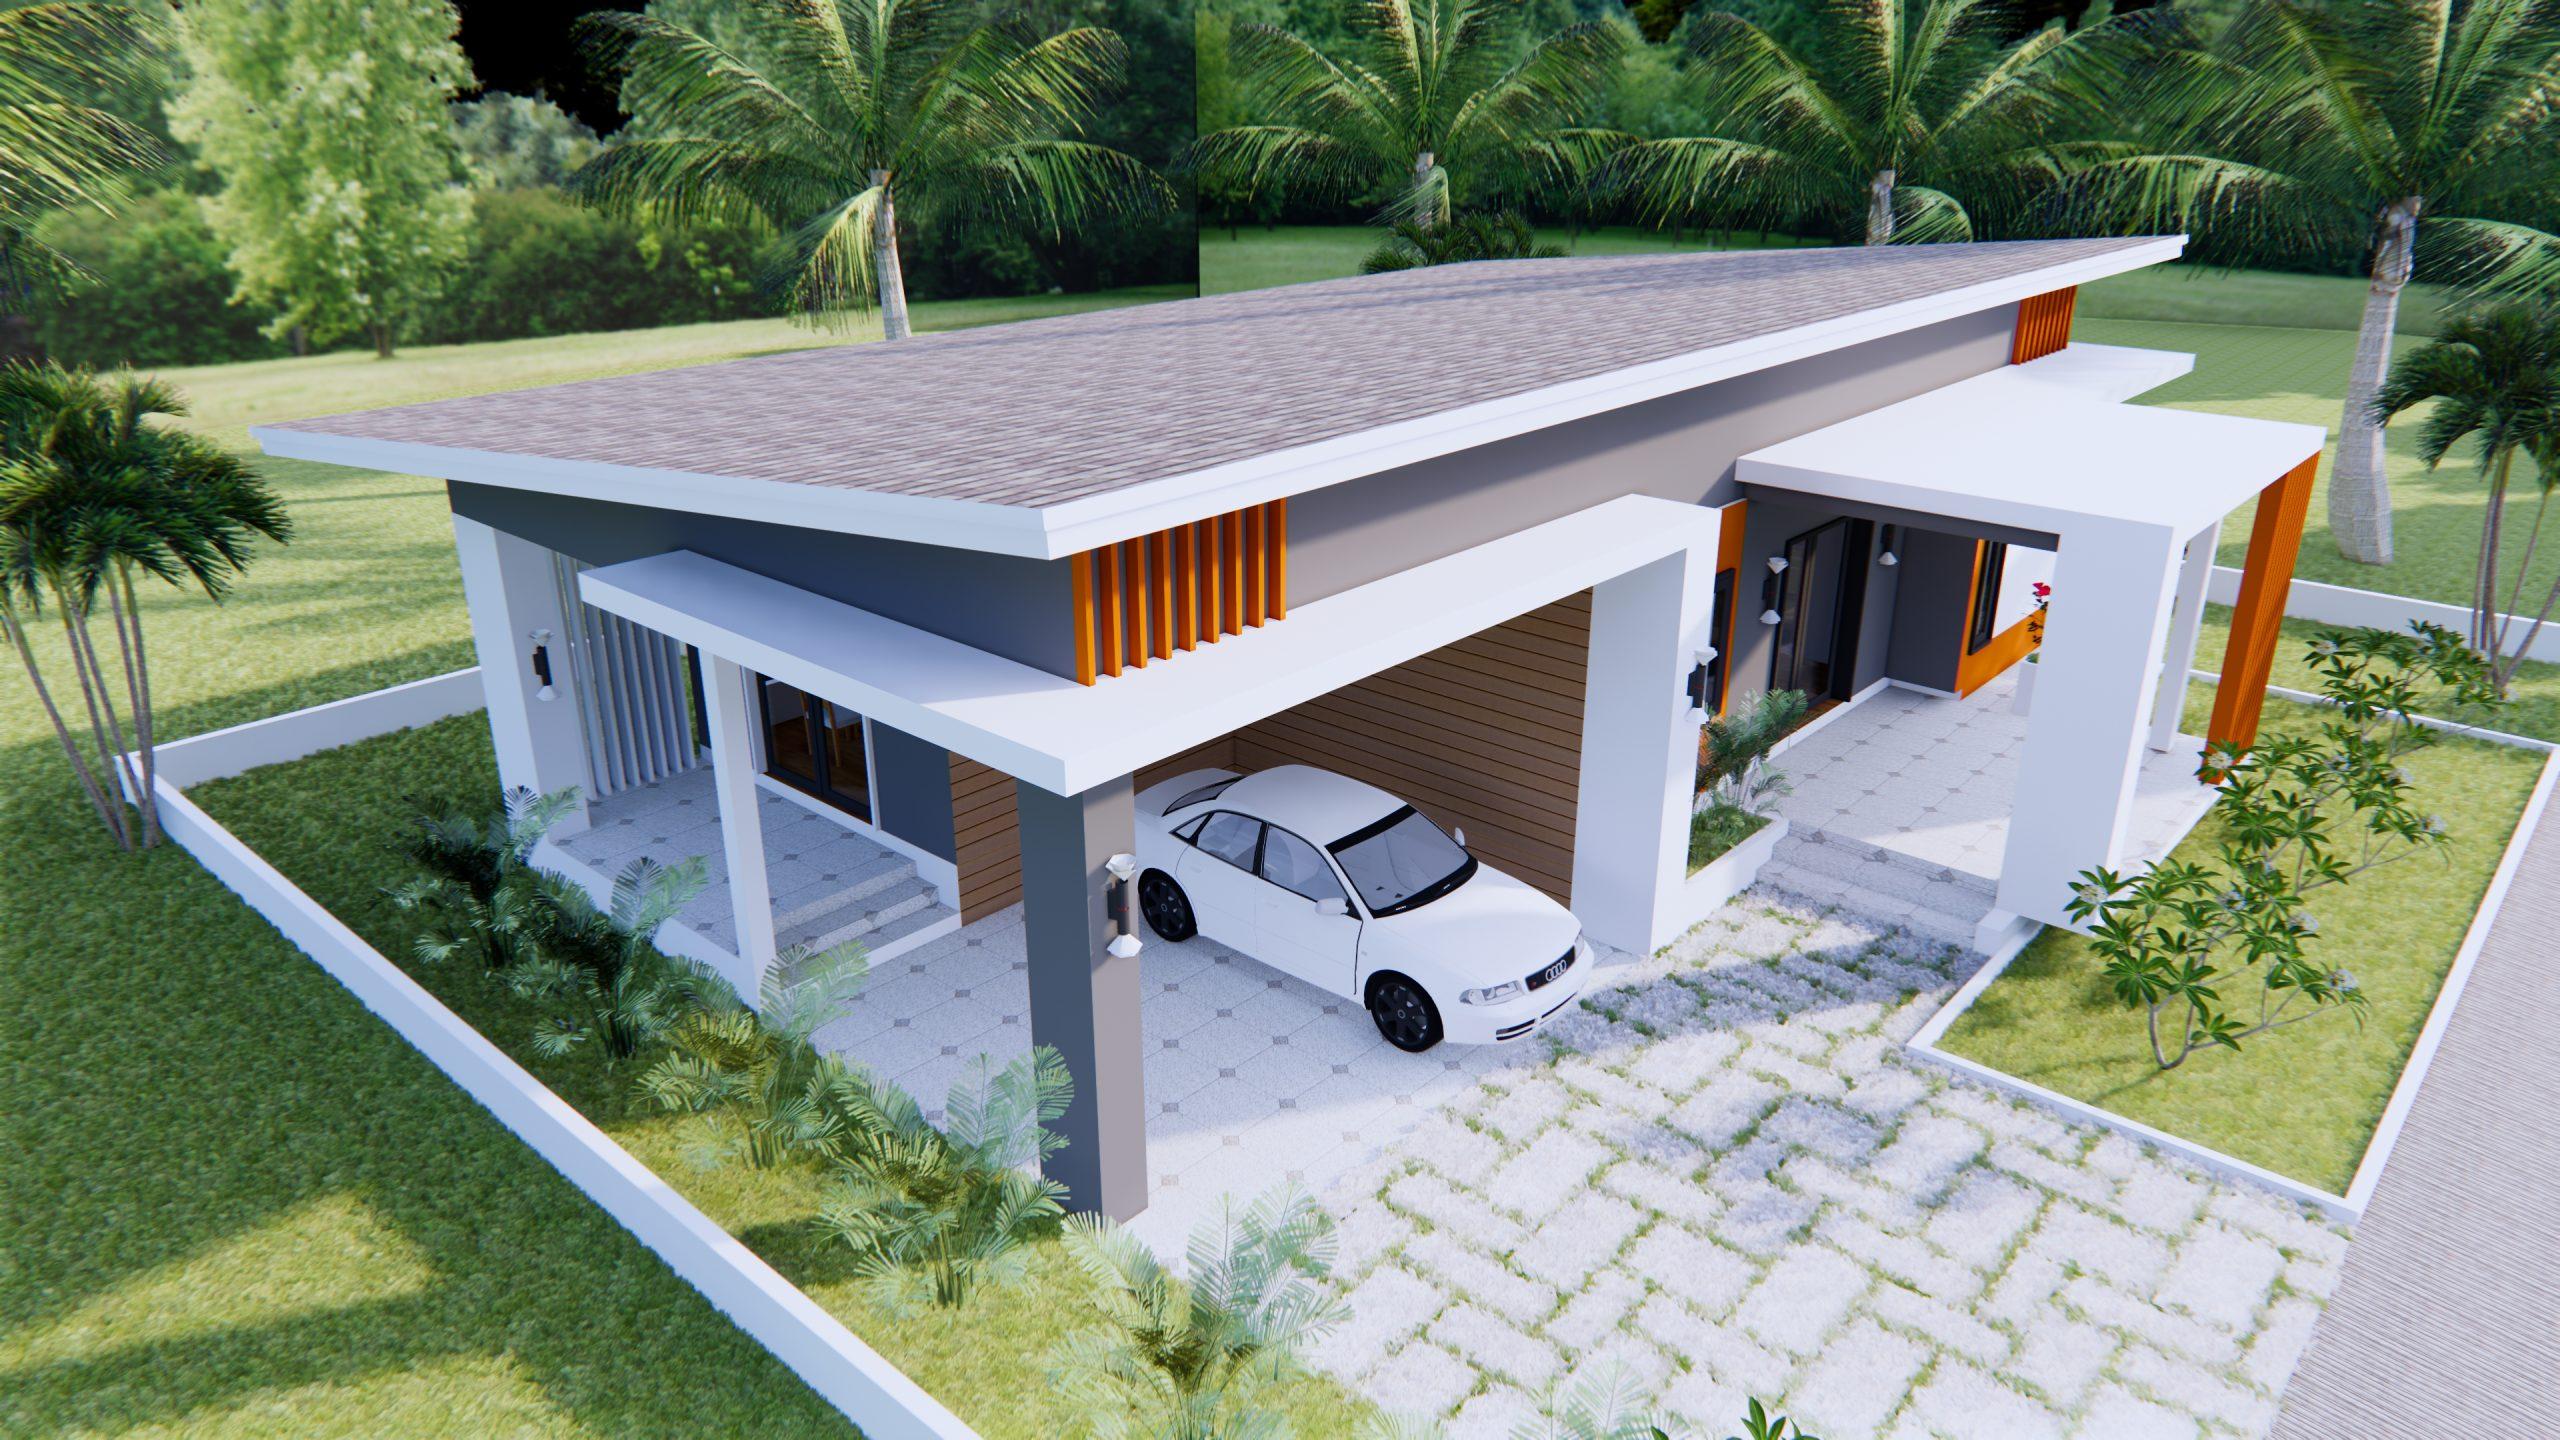 House Designs Plans 16x11 Meter 53x36 Feet 3 Beds 5